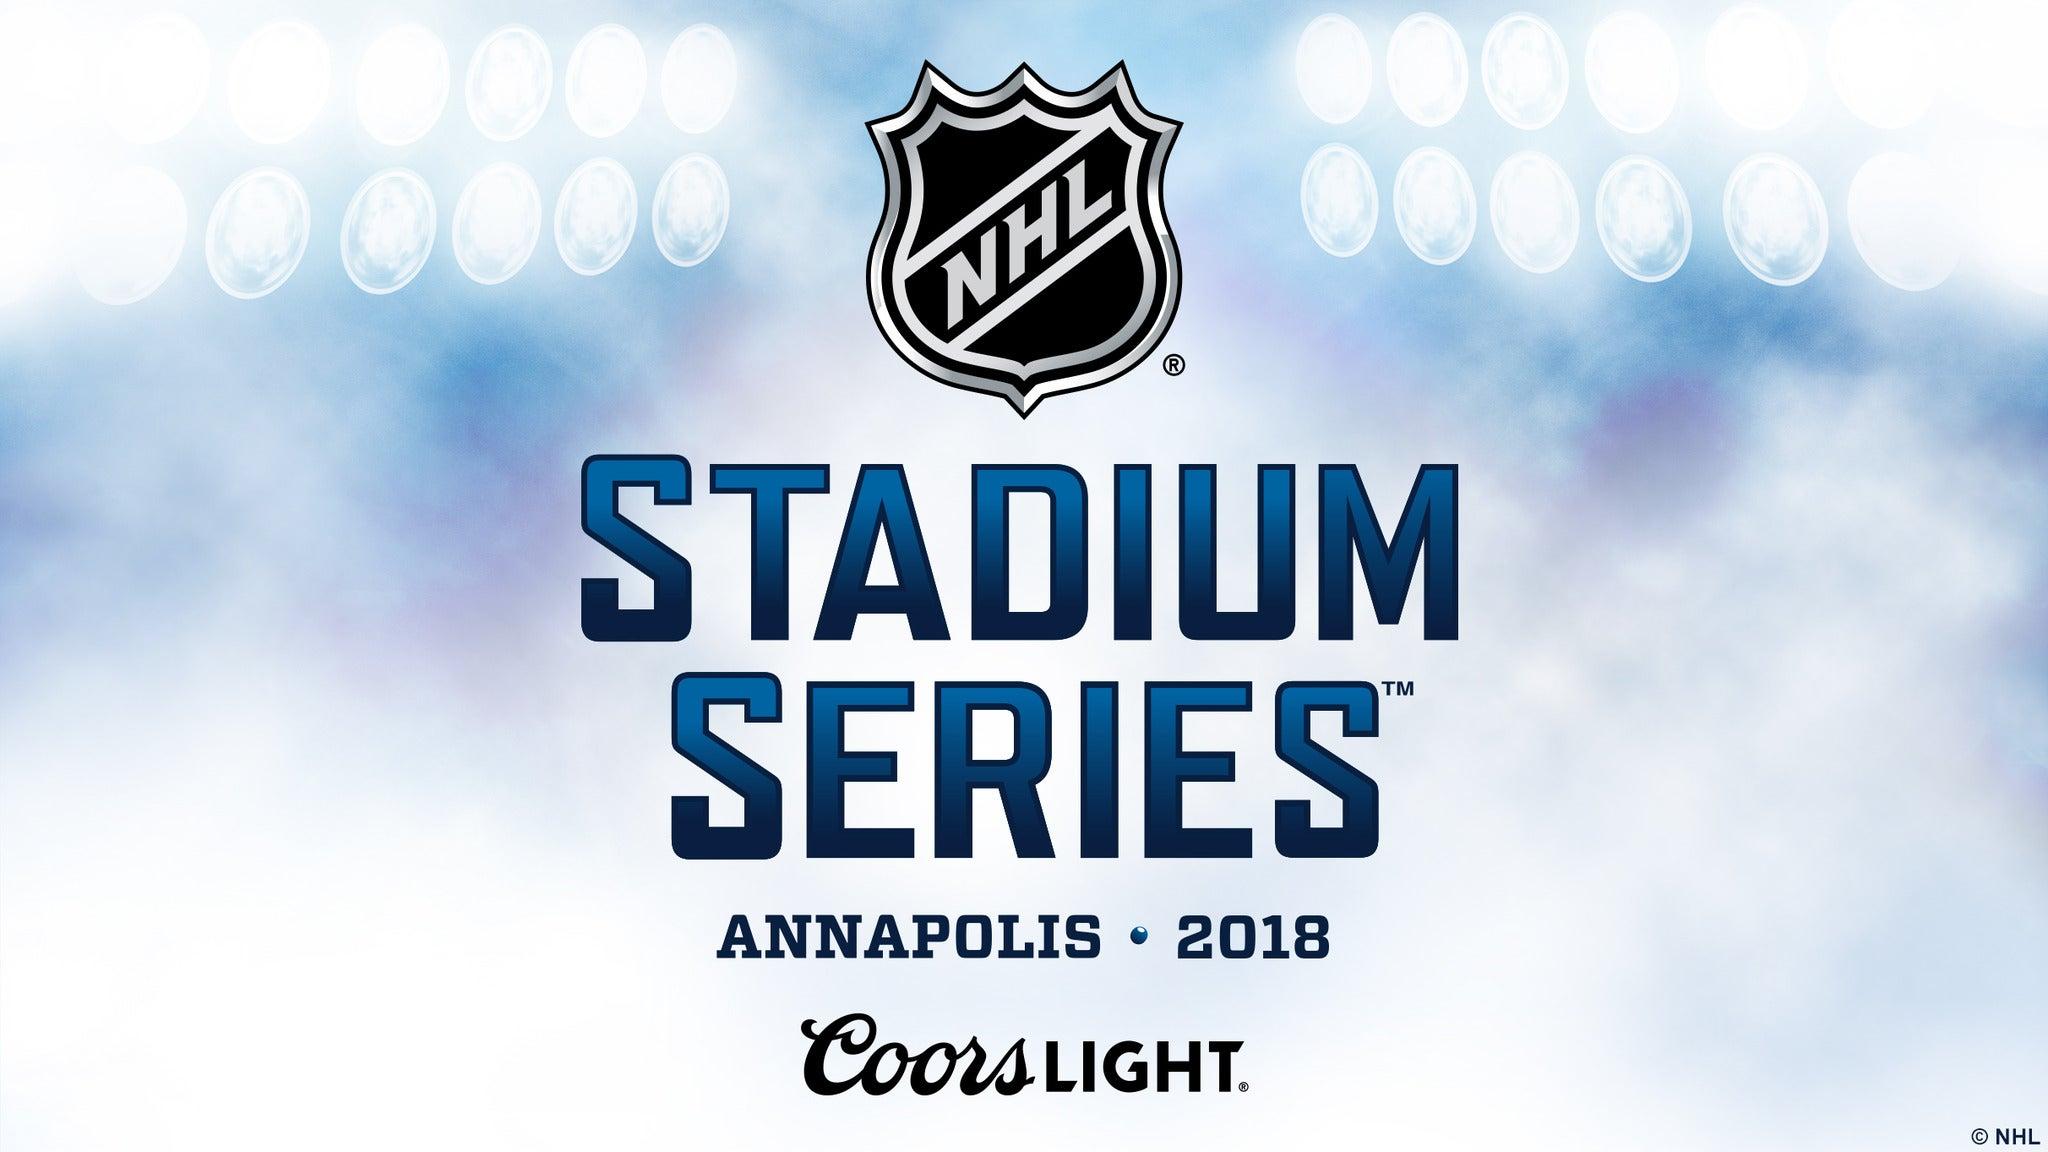 2018 Coors Light NHL Stadium Series - Maple Leafs v Capitals